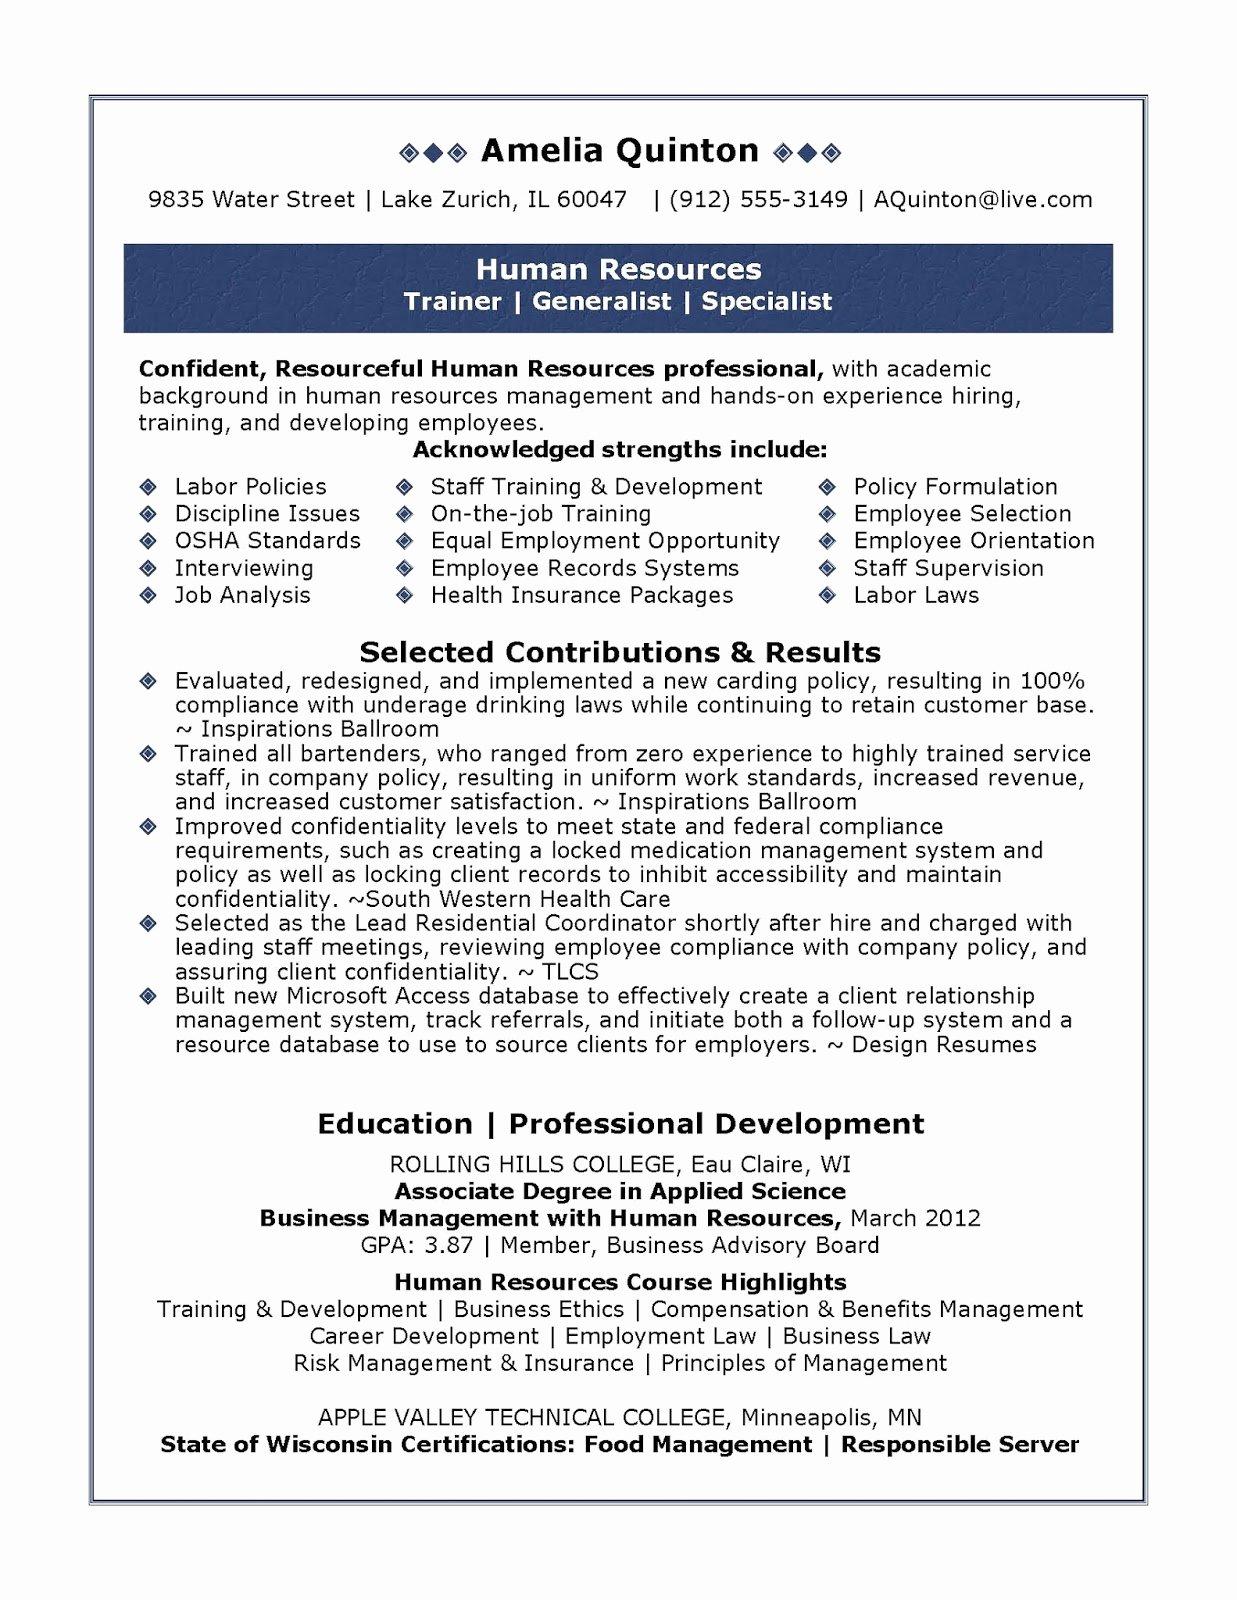 Human Resource Manager Resume Template Inspirational Sample Human Resources Resume